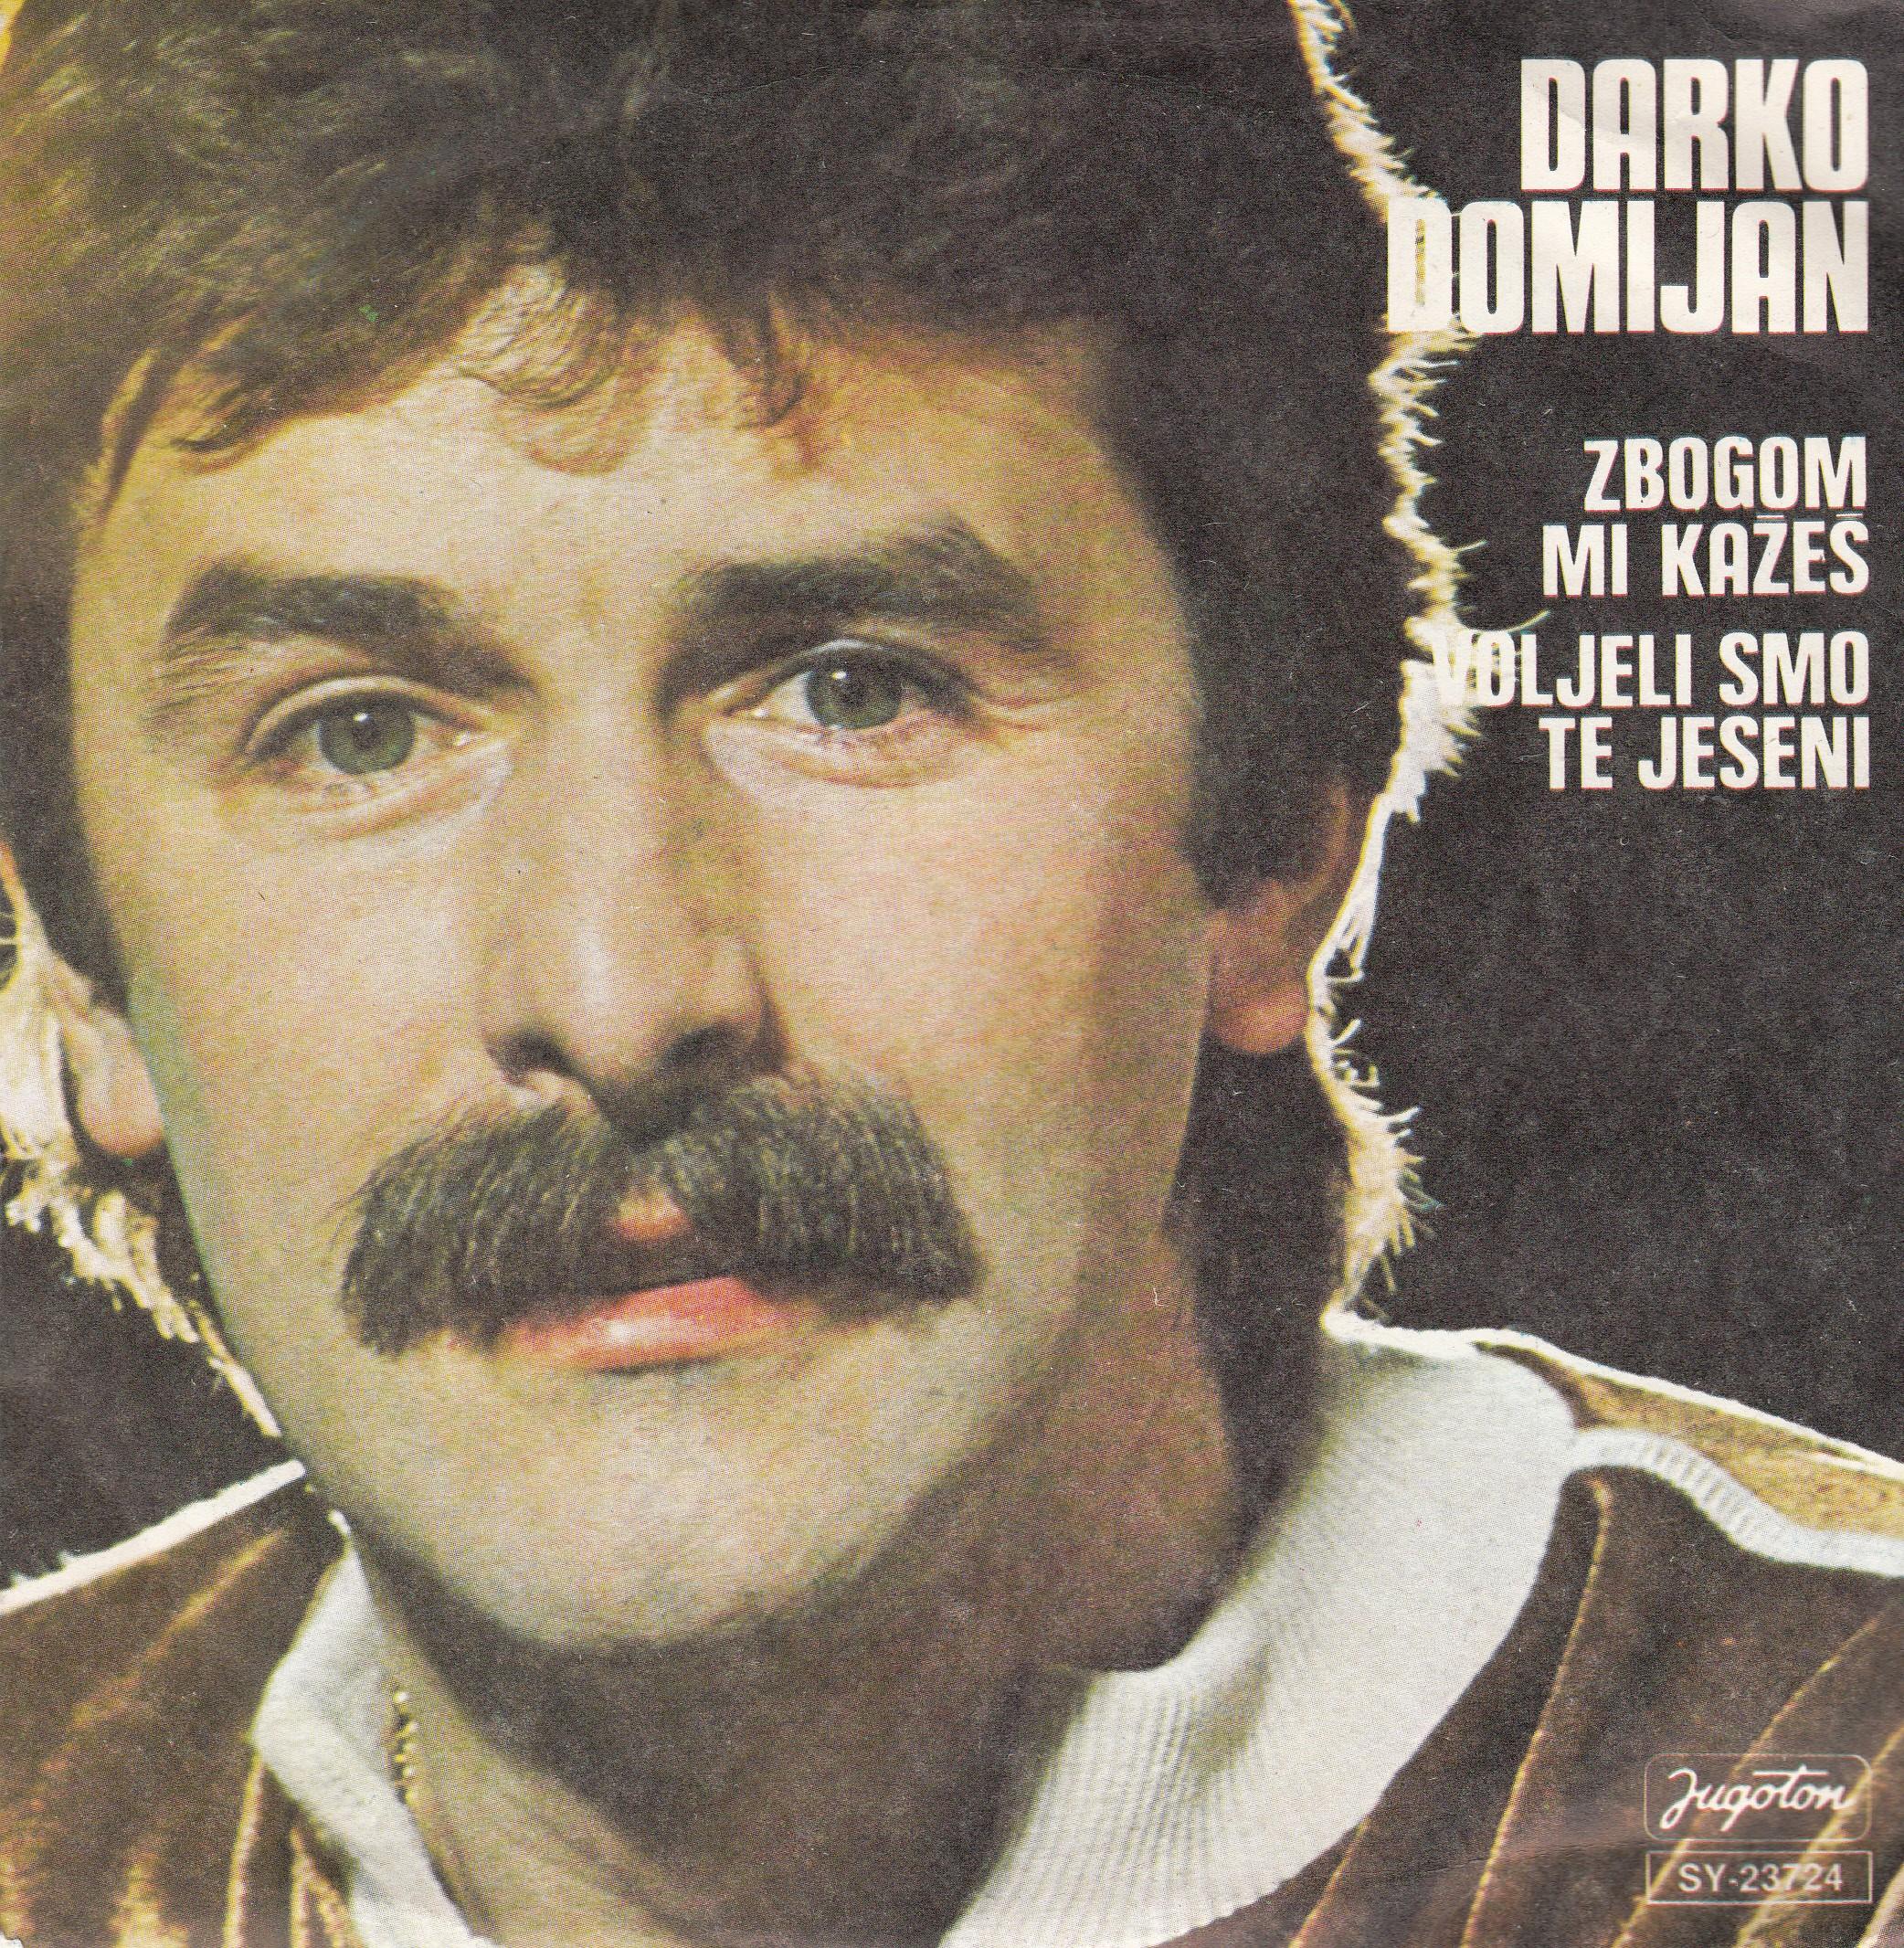 Domijan Darko - Zbogom Mi Kazes/voljeli Smo Te Jeseni